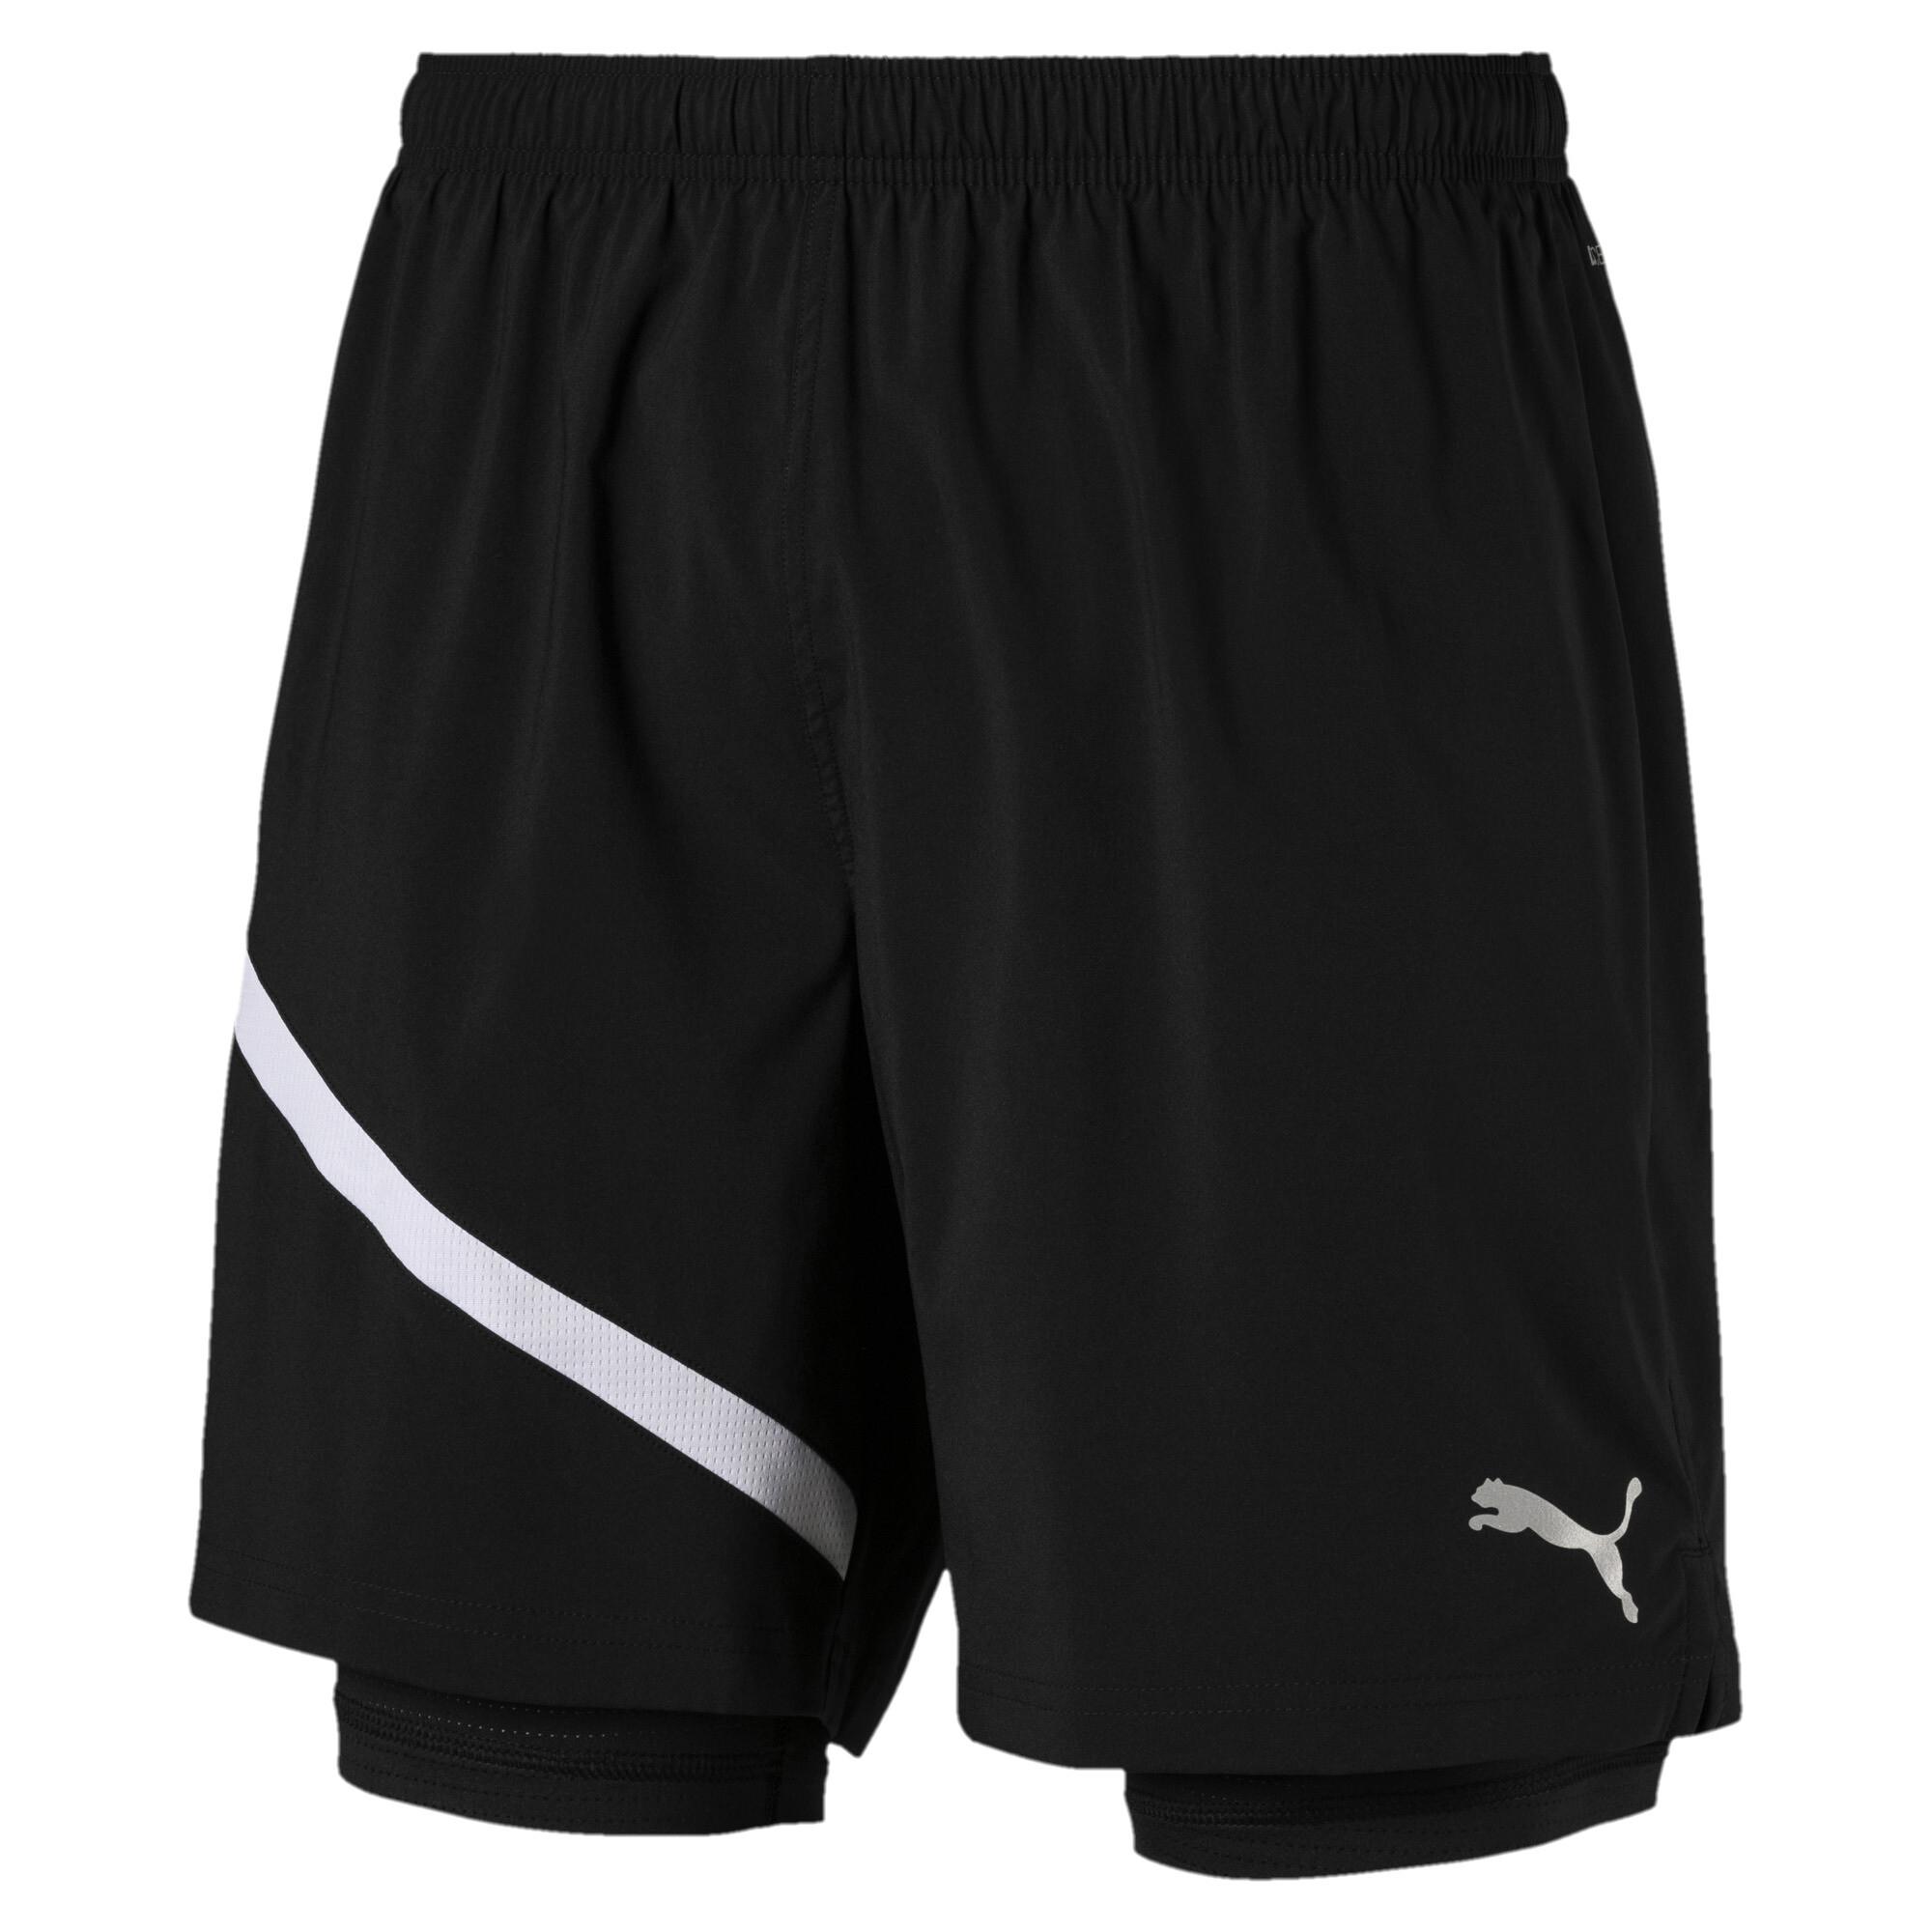 Image Puma Ignite Woven 2 in 1 Men's Running Shorts #5